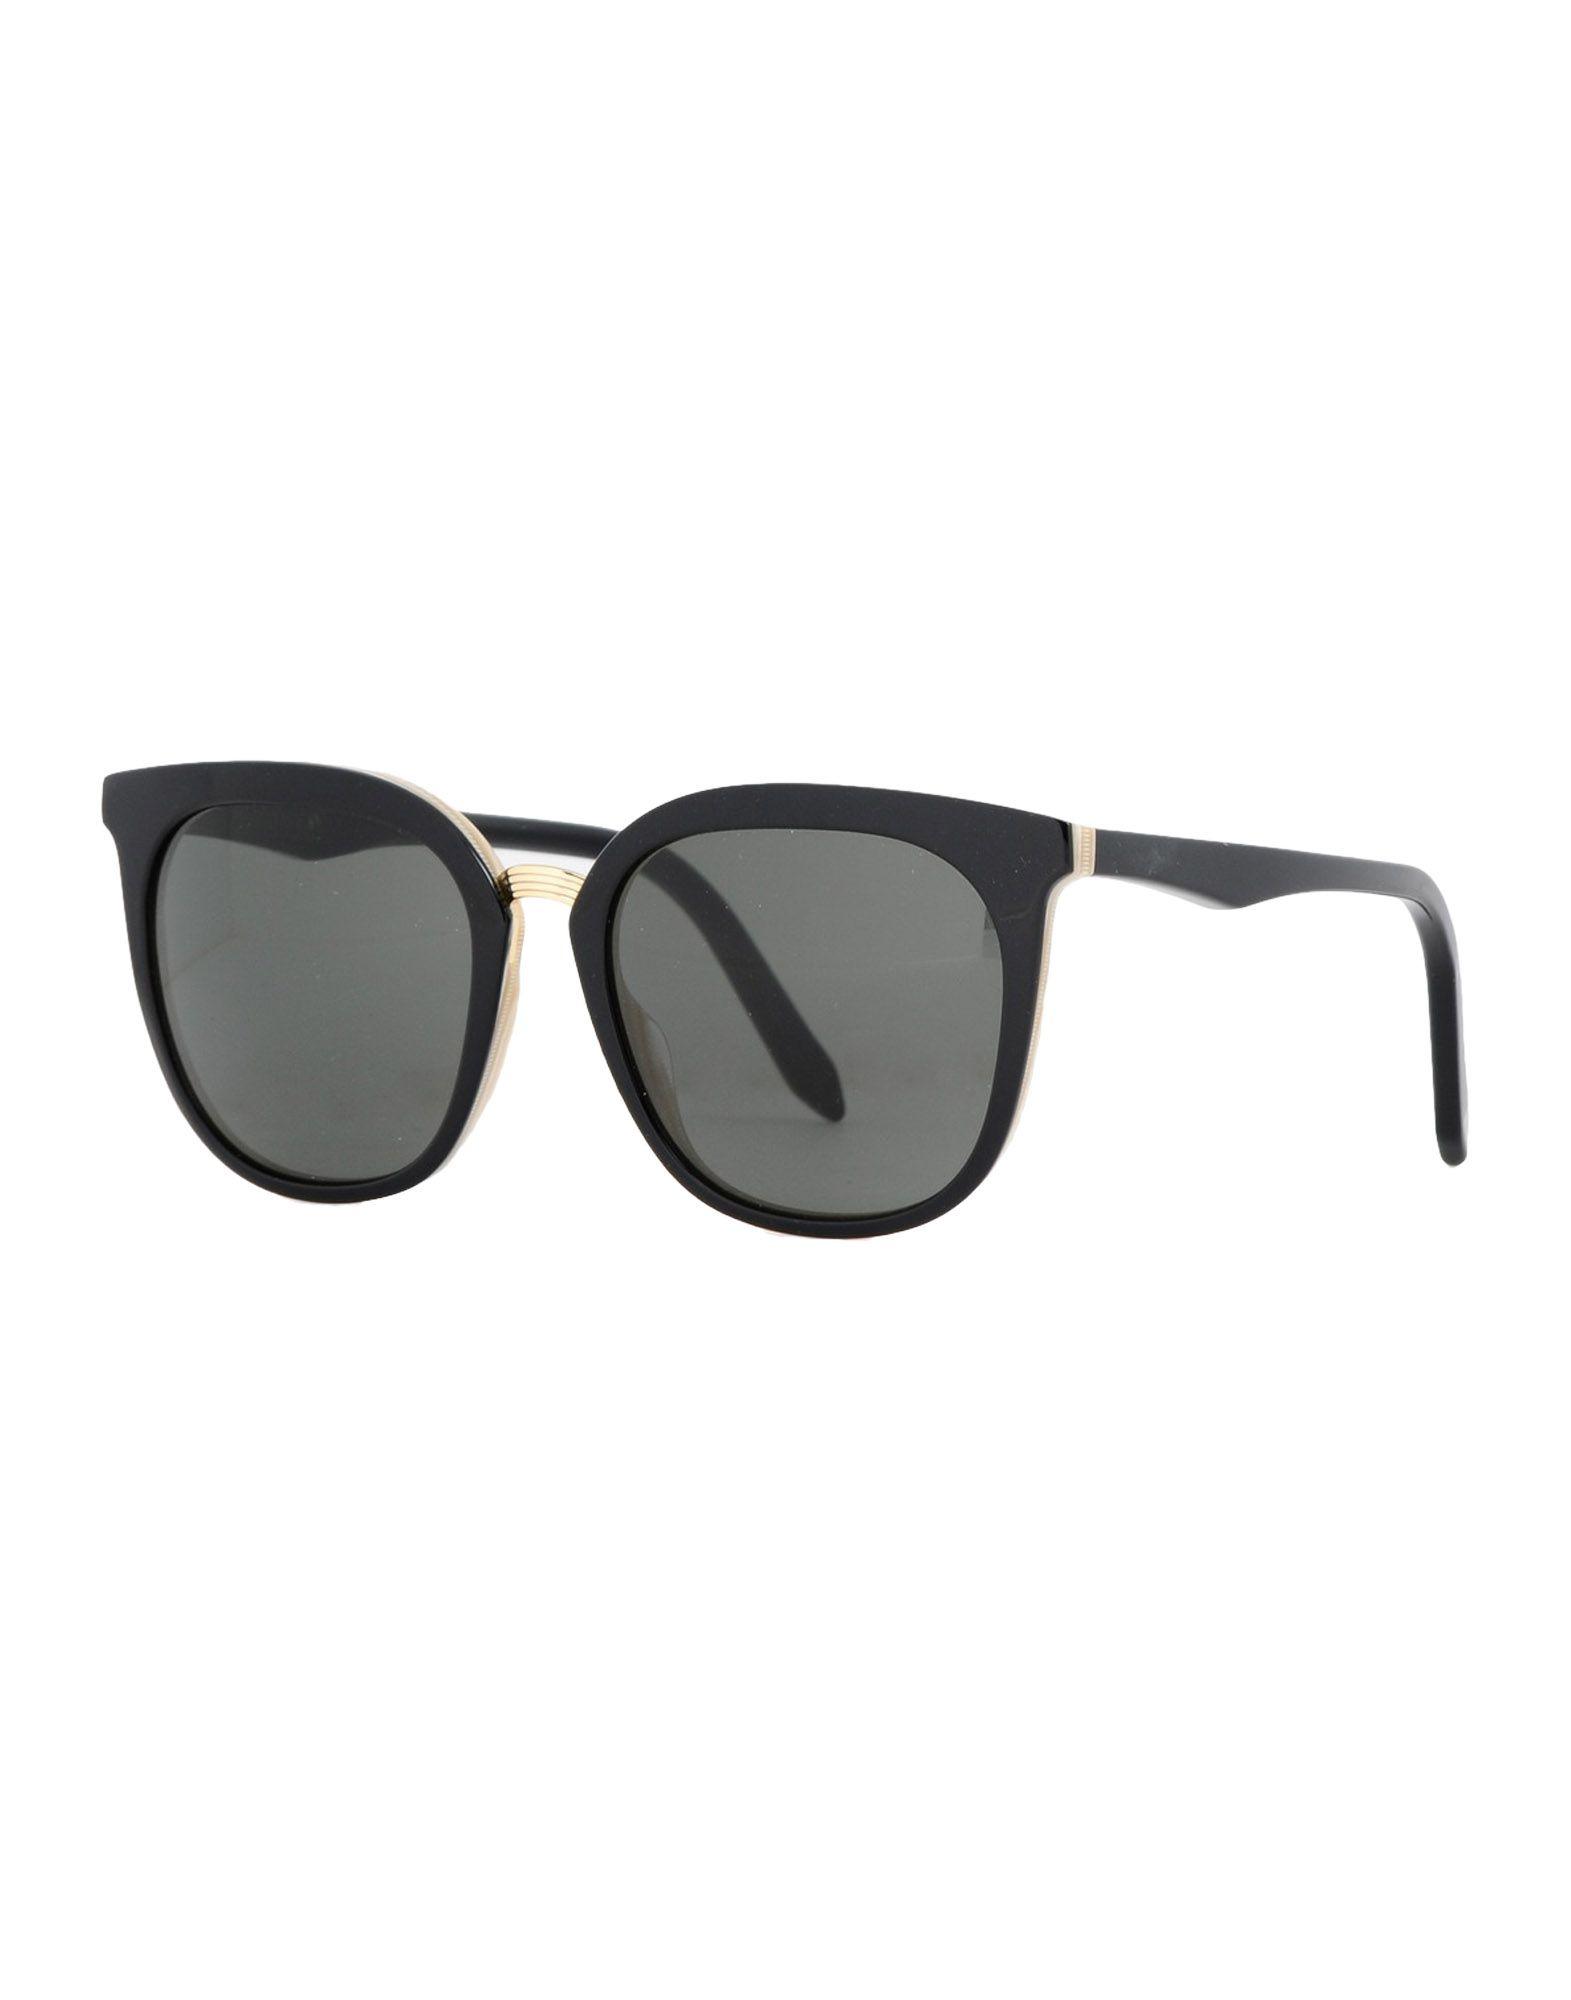 f3b995cf74 Women s sunglasses online  round and squared sunglasses